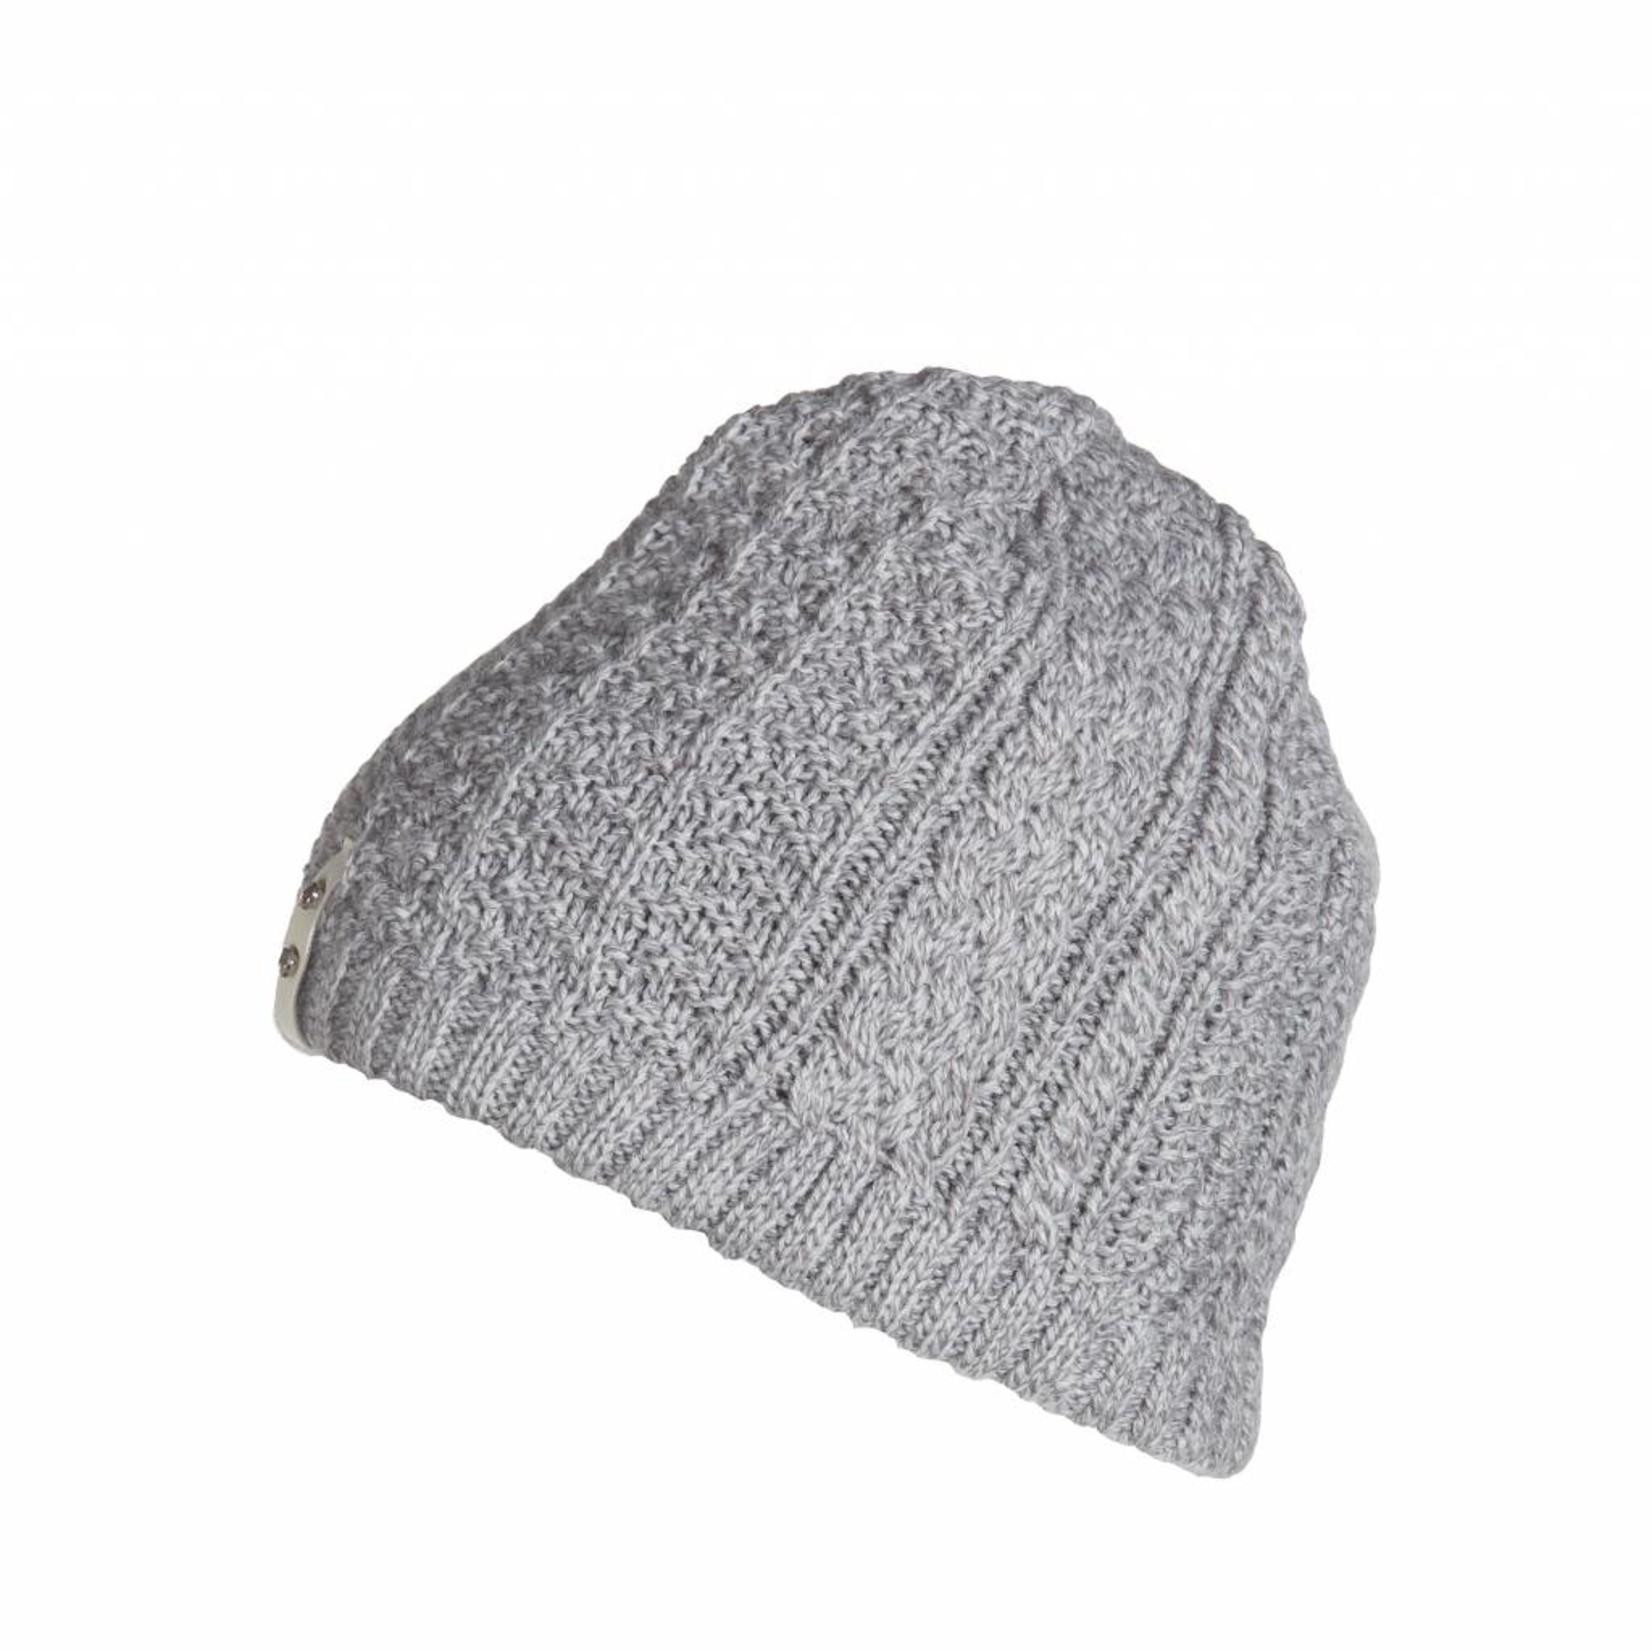 PHENIX Moonlight Knit Hat - GR